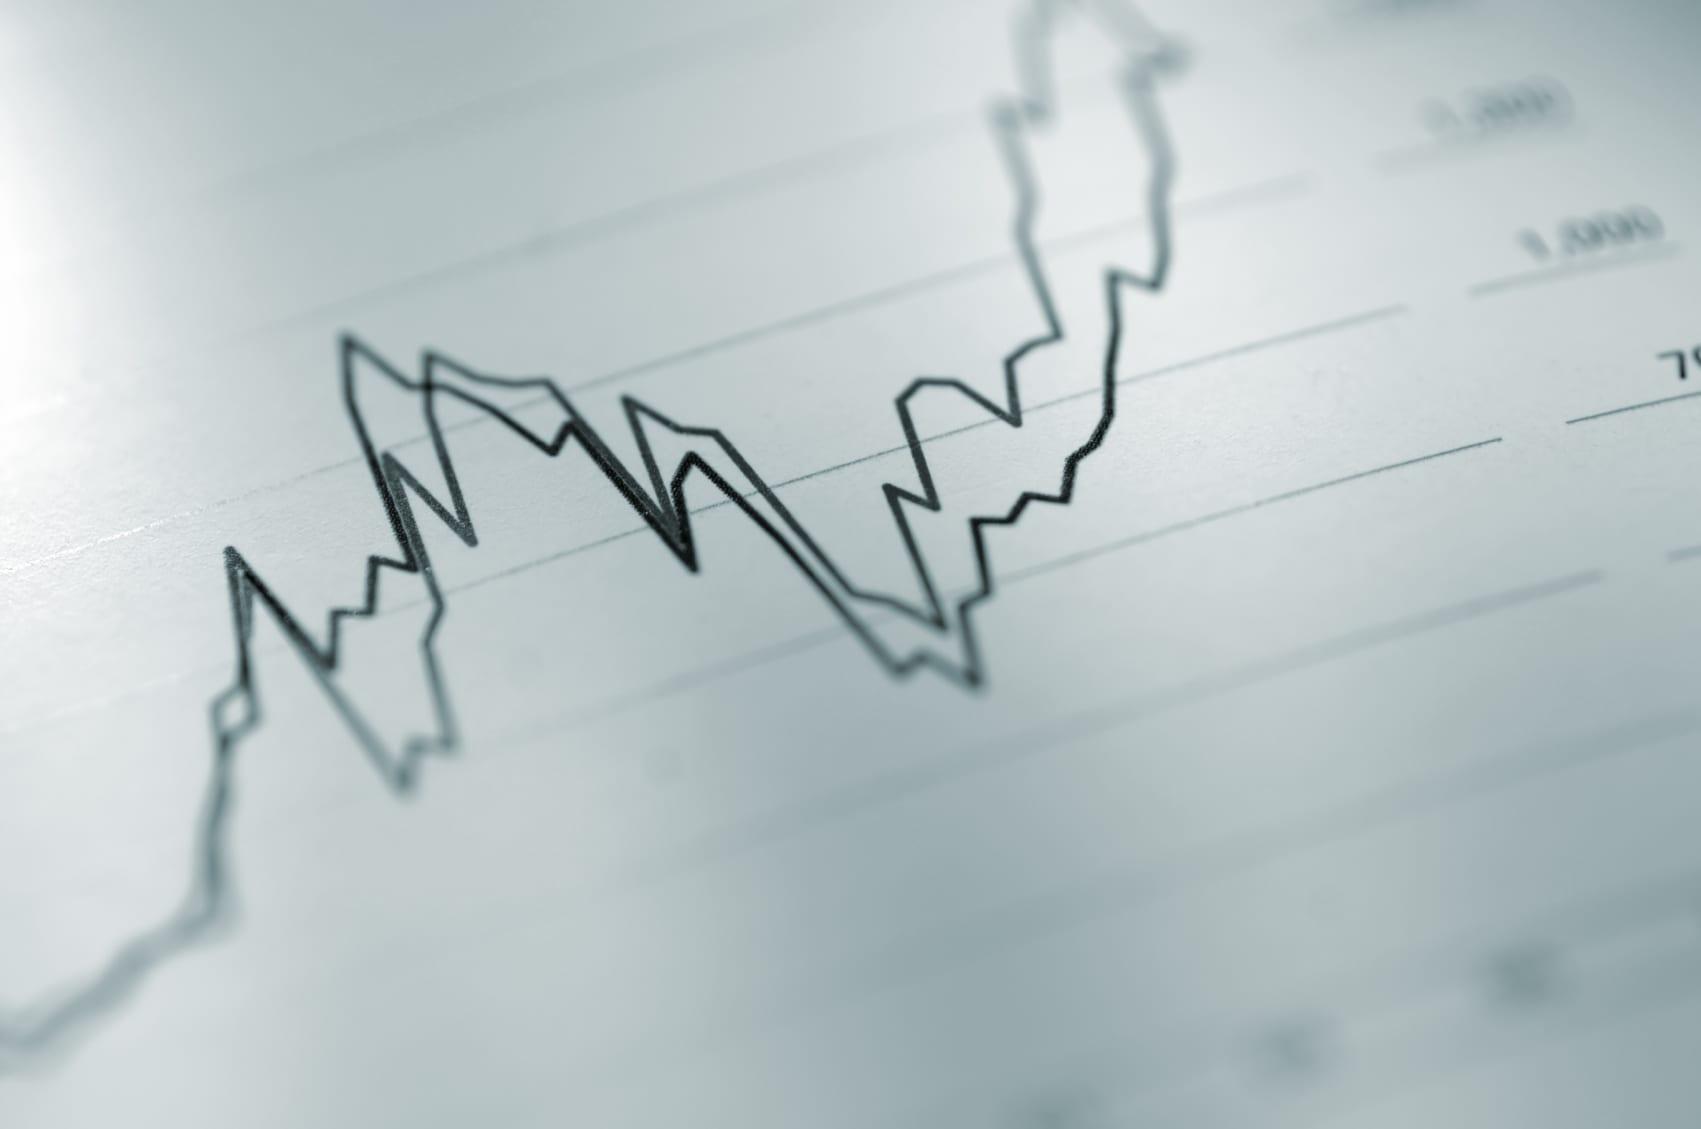 Upward Trend On Chart Stock Photo